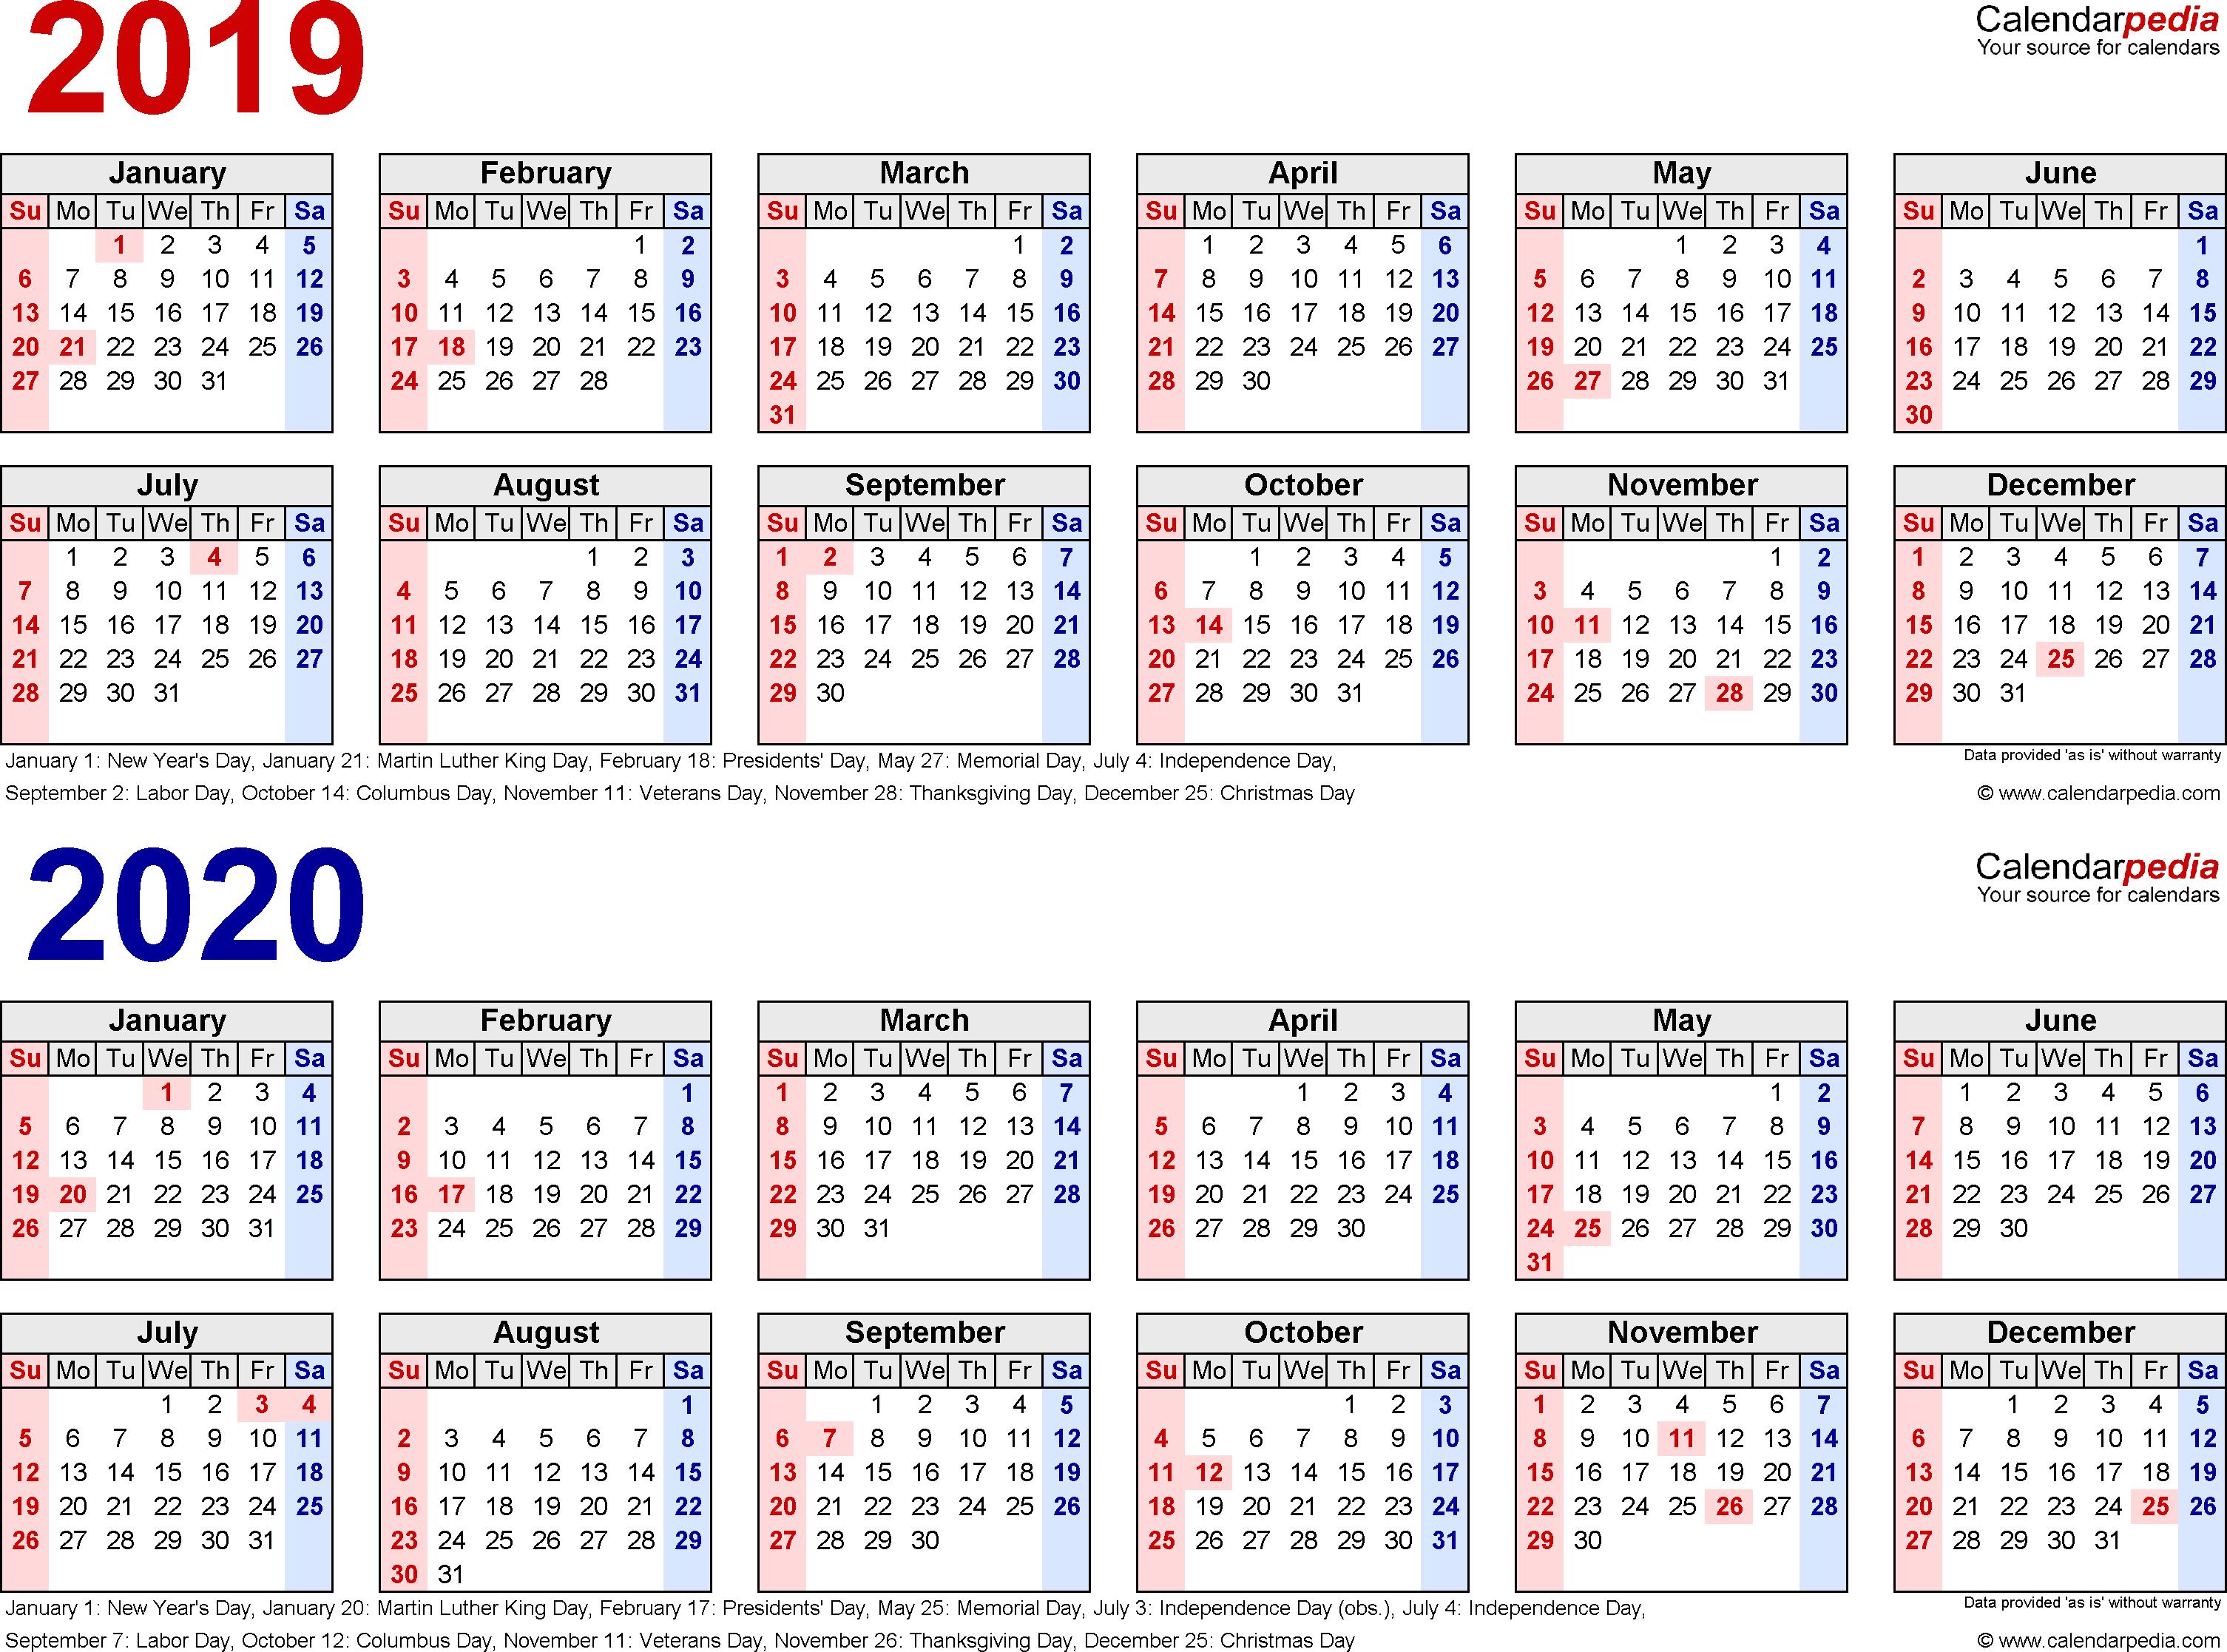 2019-2020 Calendar - Free Printable Two-Year Pdf Calendars in Pocket Printable 2019-2020 Calendar Free